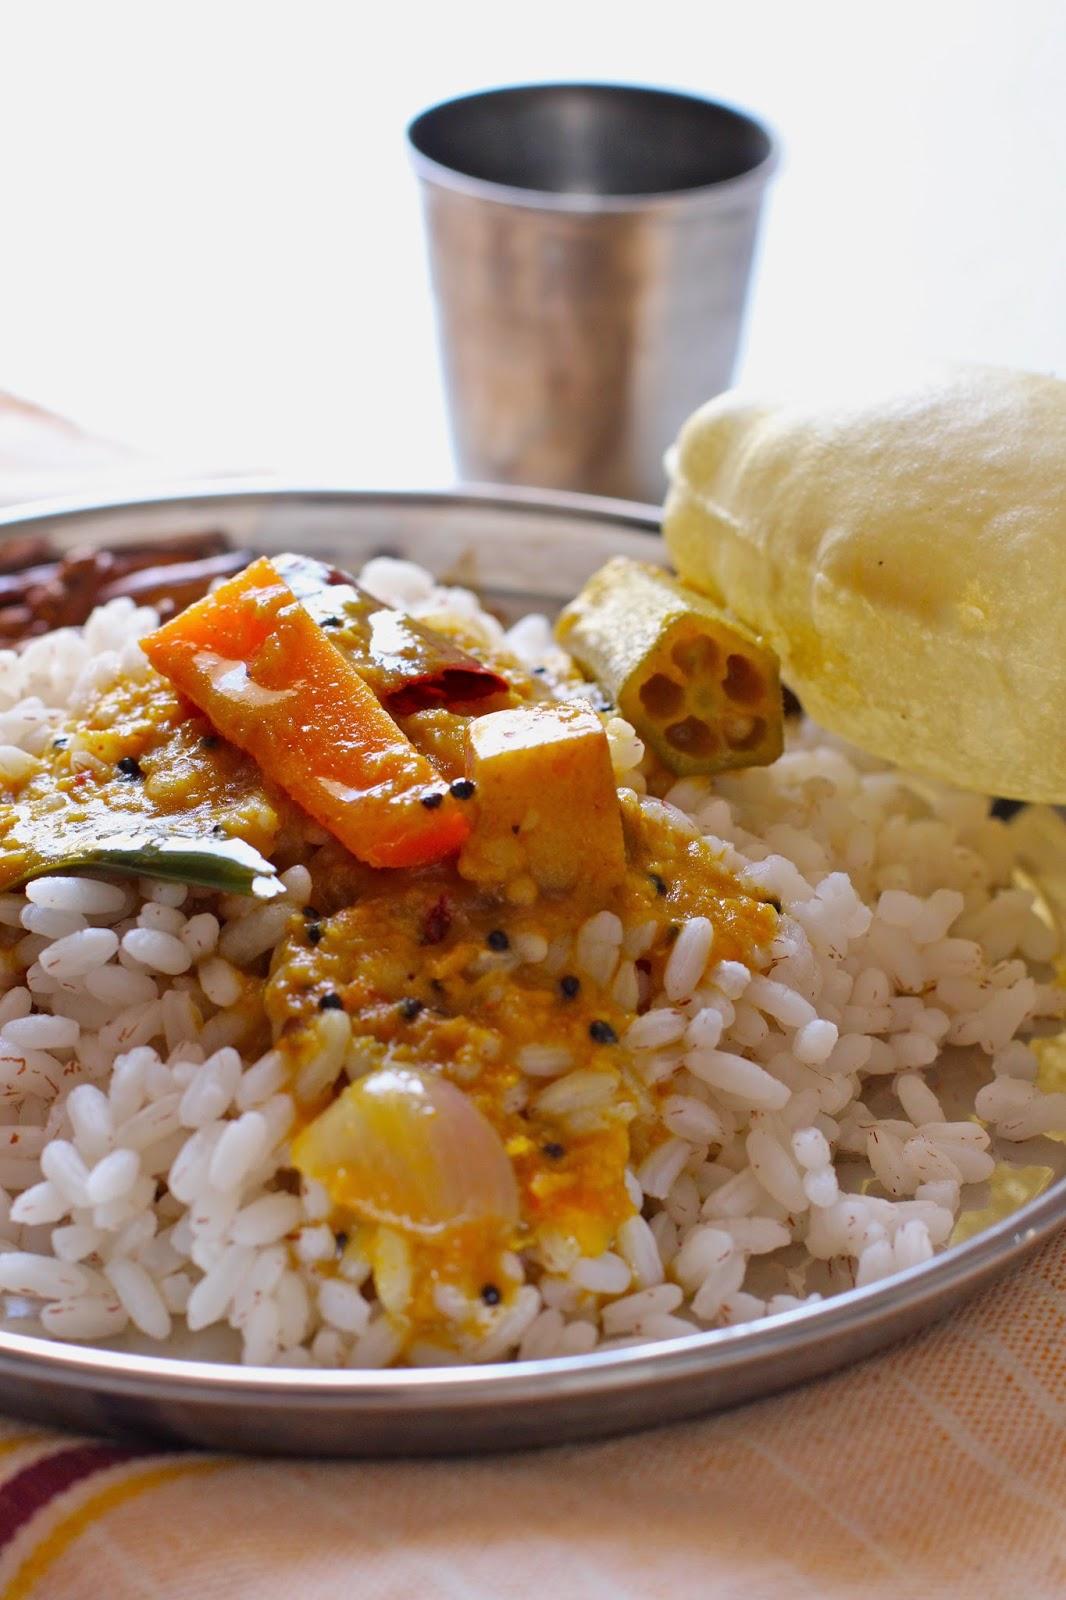 how to make sambar using sambar powder